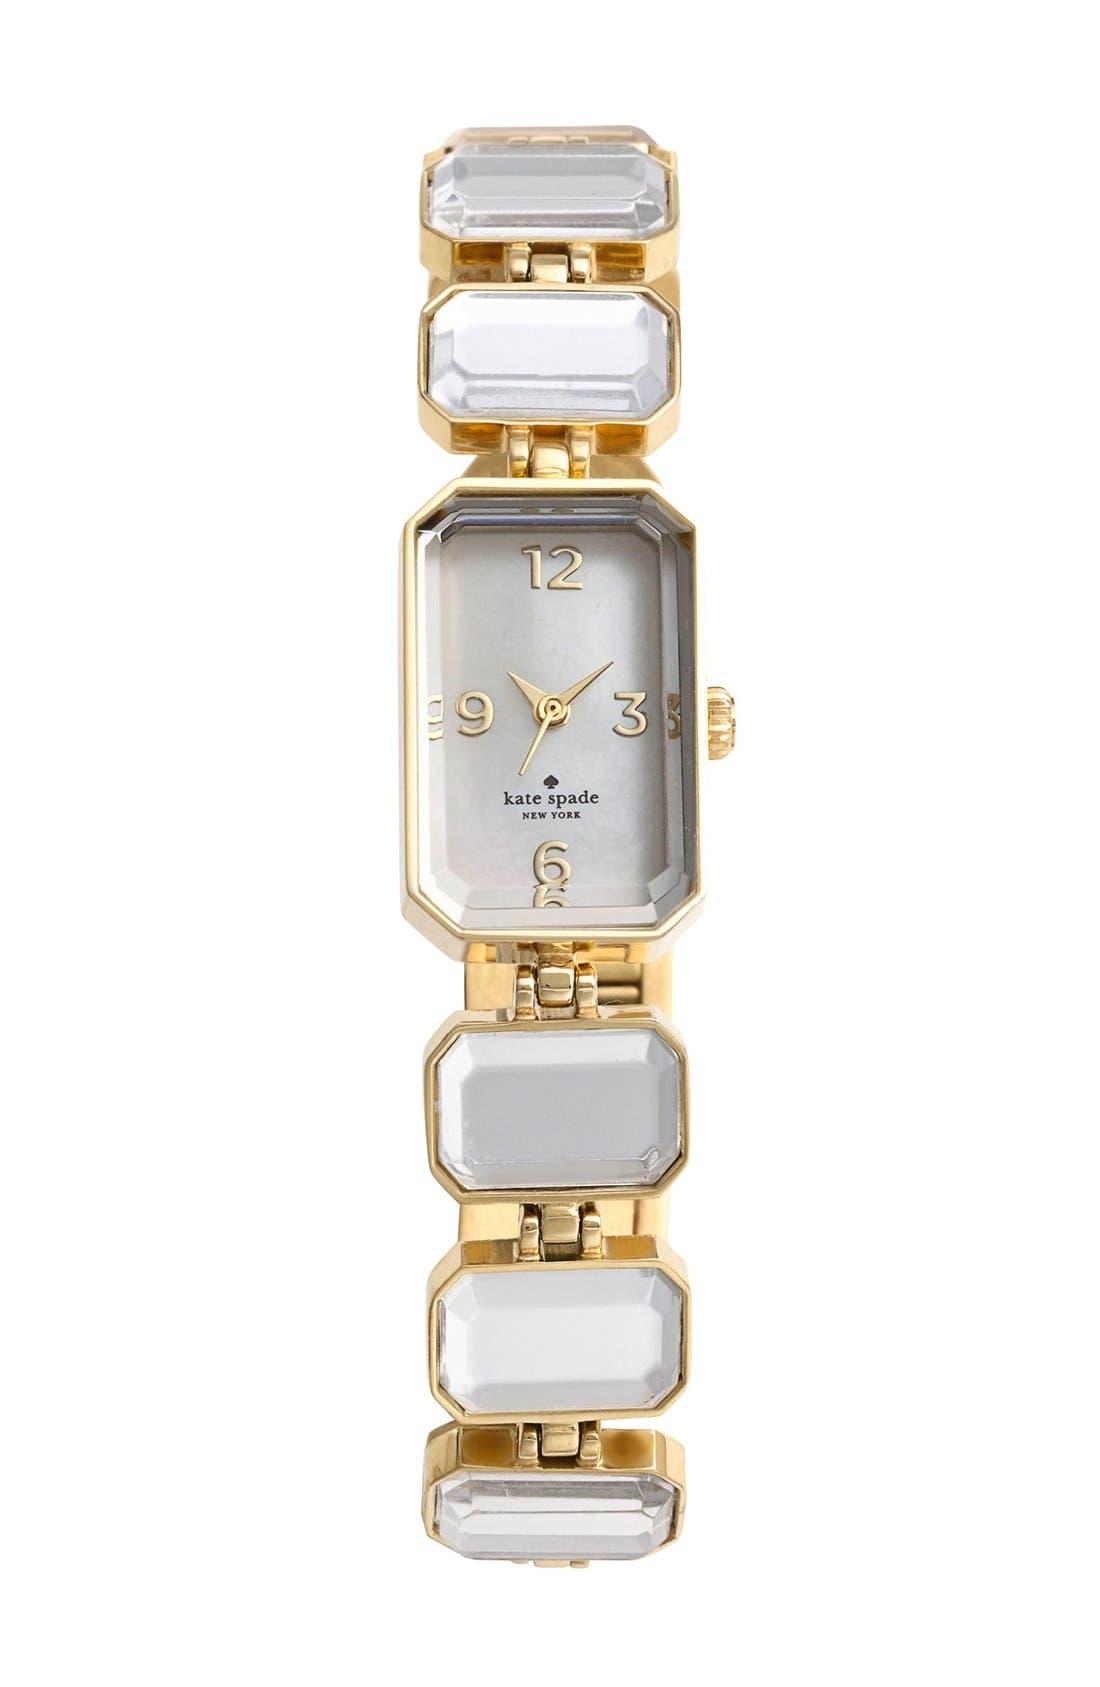 Main Image - kate spade new york 'wythe' crystal bracelet watch, 10mm x 25mm